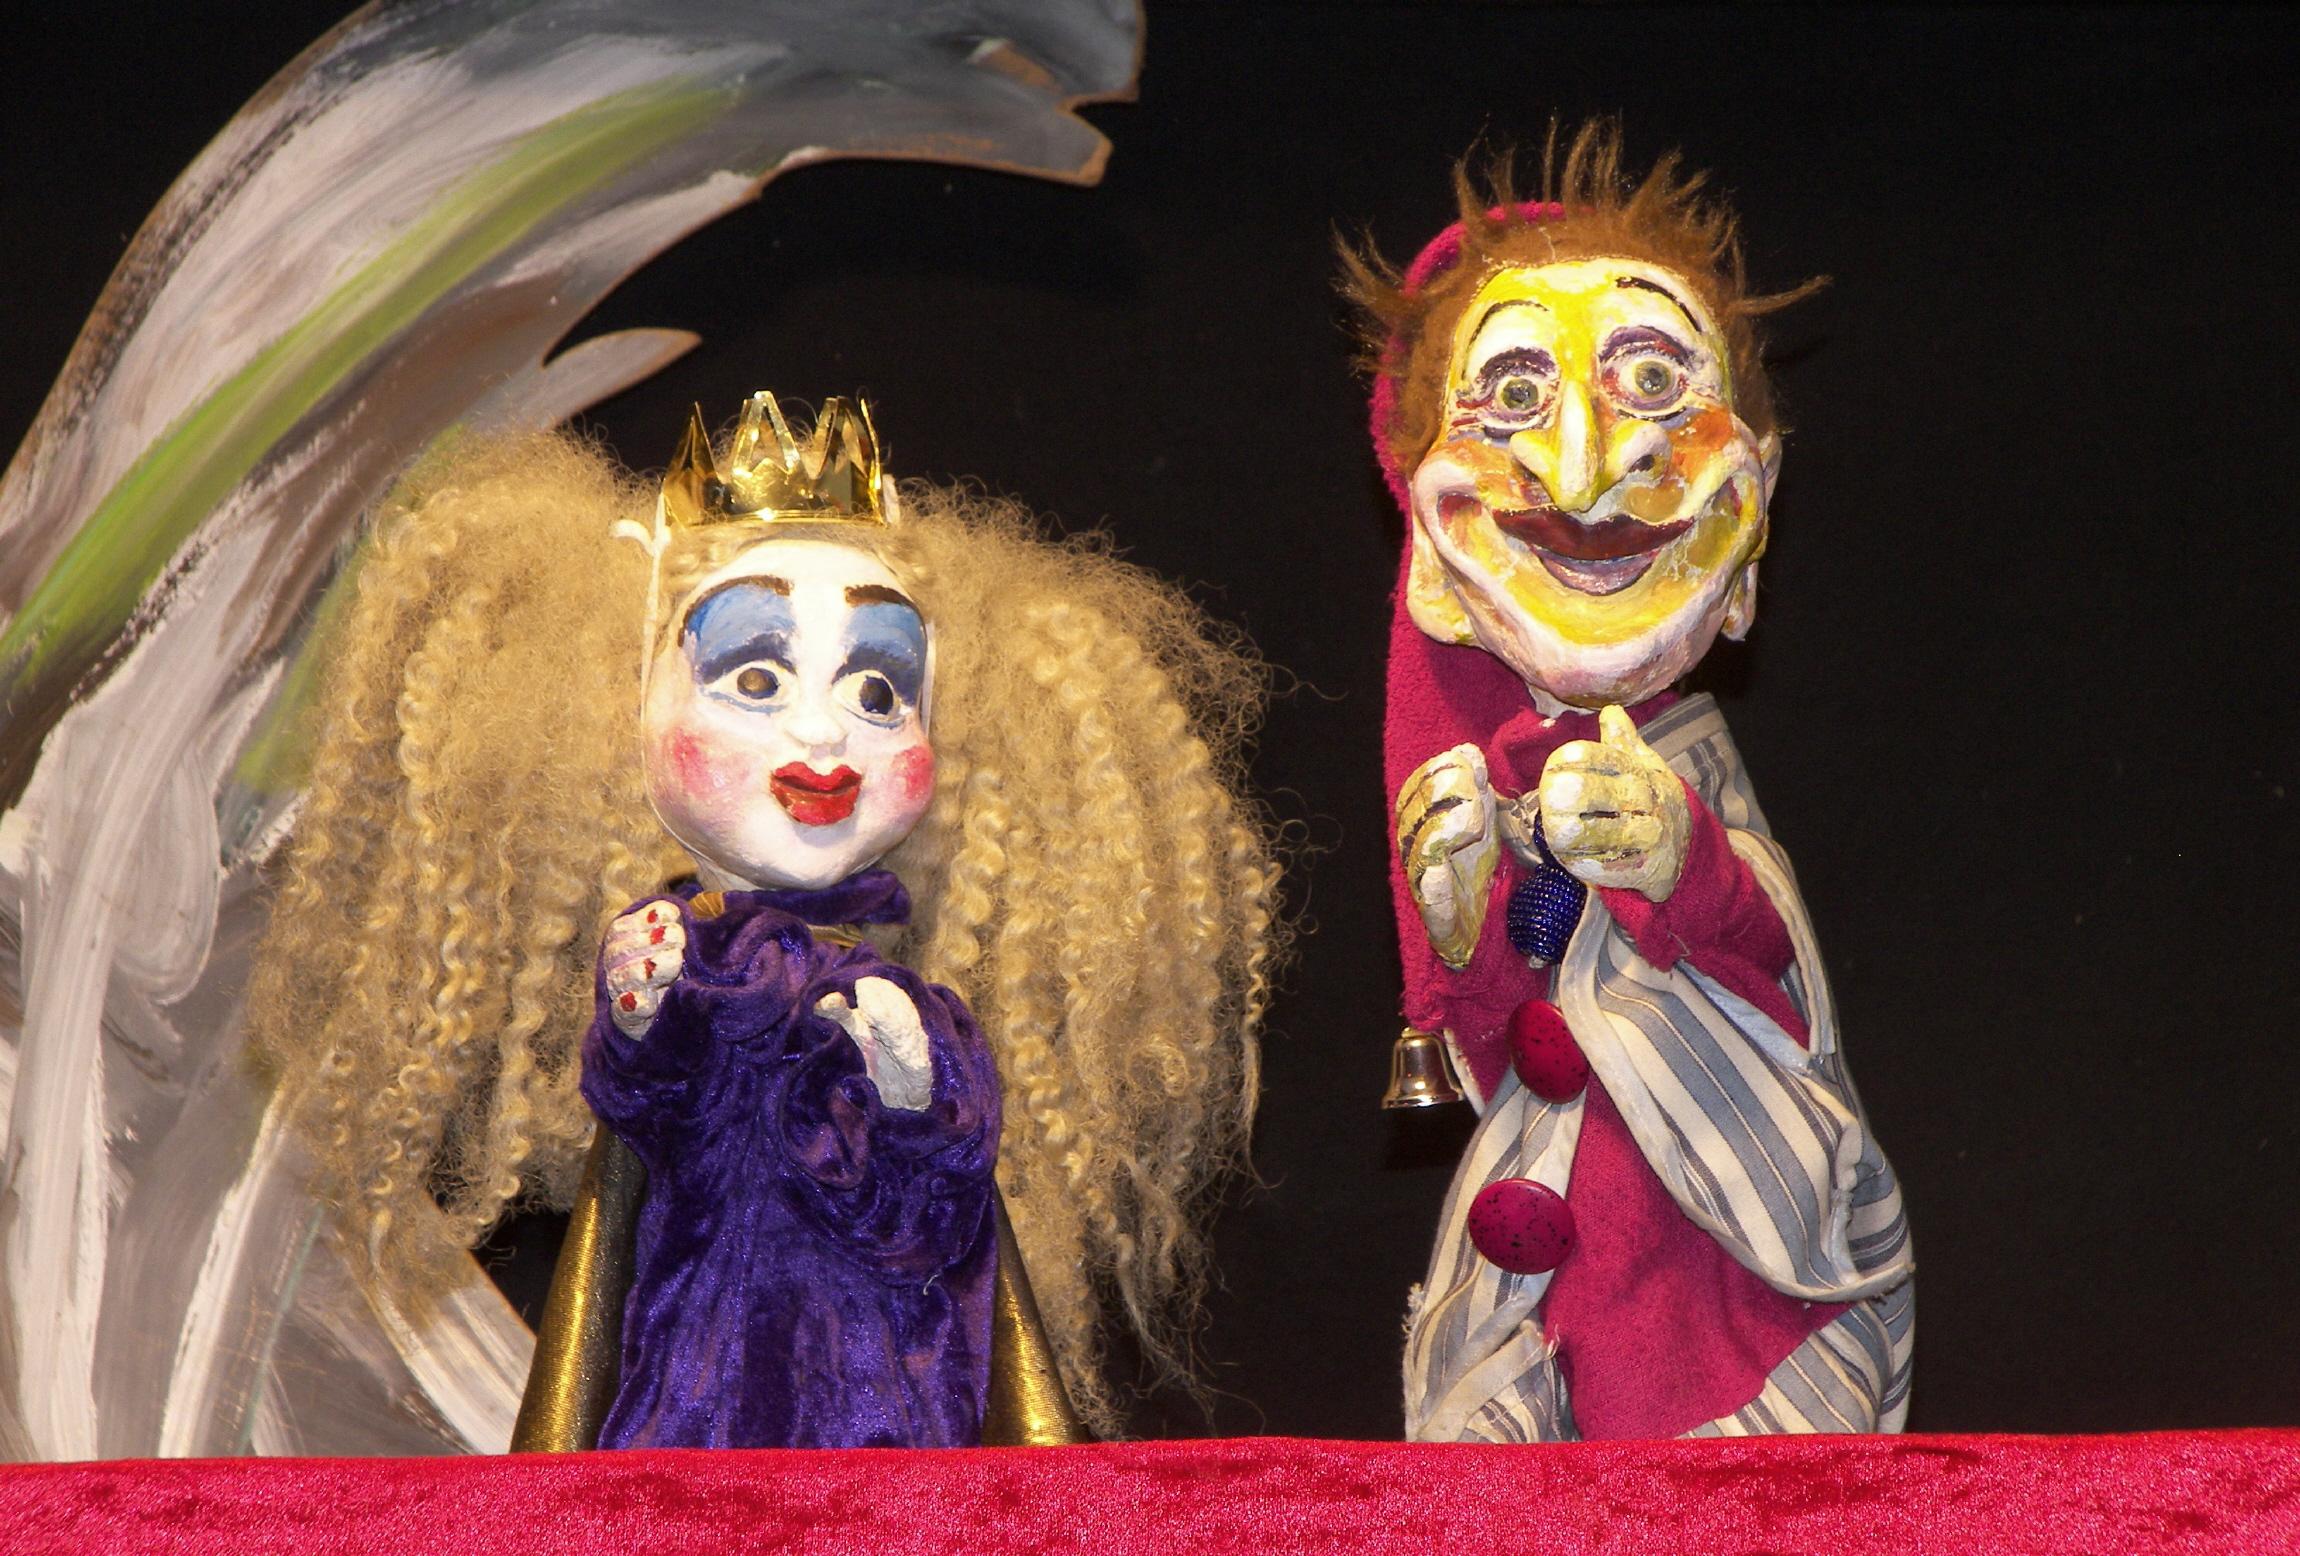 Professor Pröpstel - Prinzessin Kasperl - Kaspertheater, Kinder, Spass, Unterhaltung, Comedy